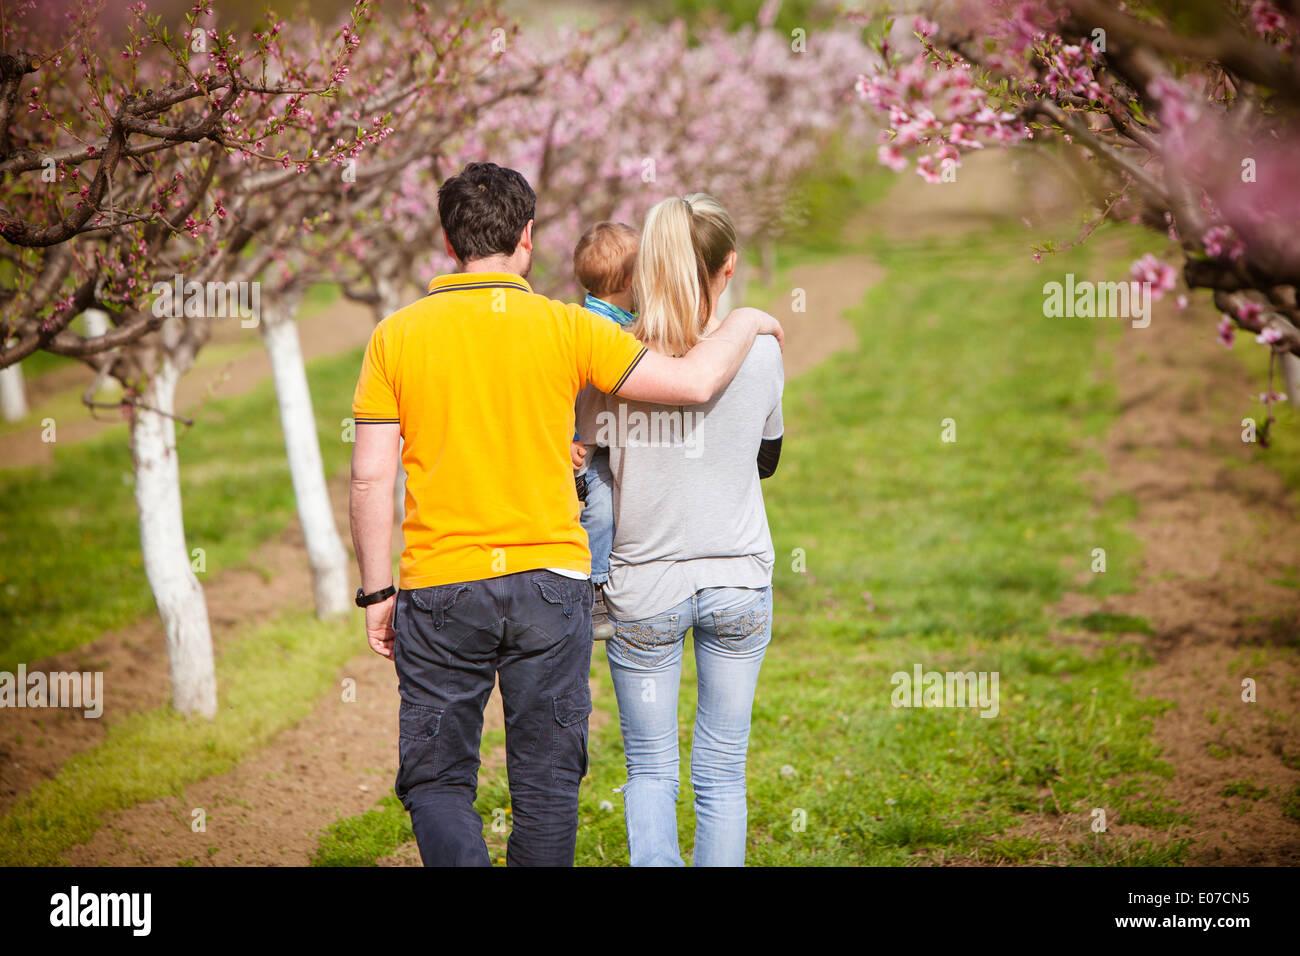 Parents with toddler boy walking next to cherry trees, Austria - Stock Image